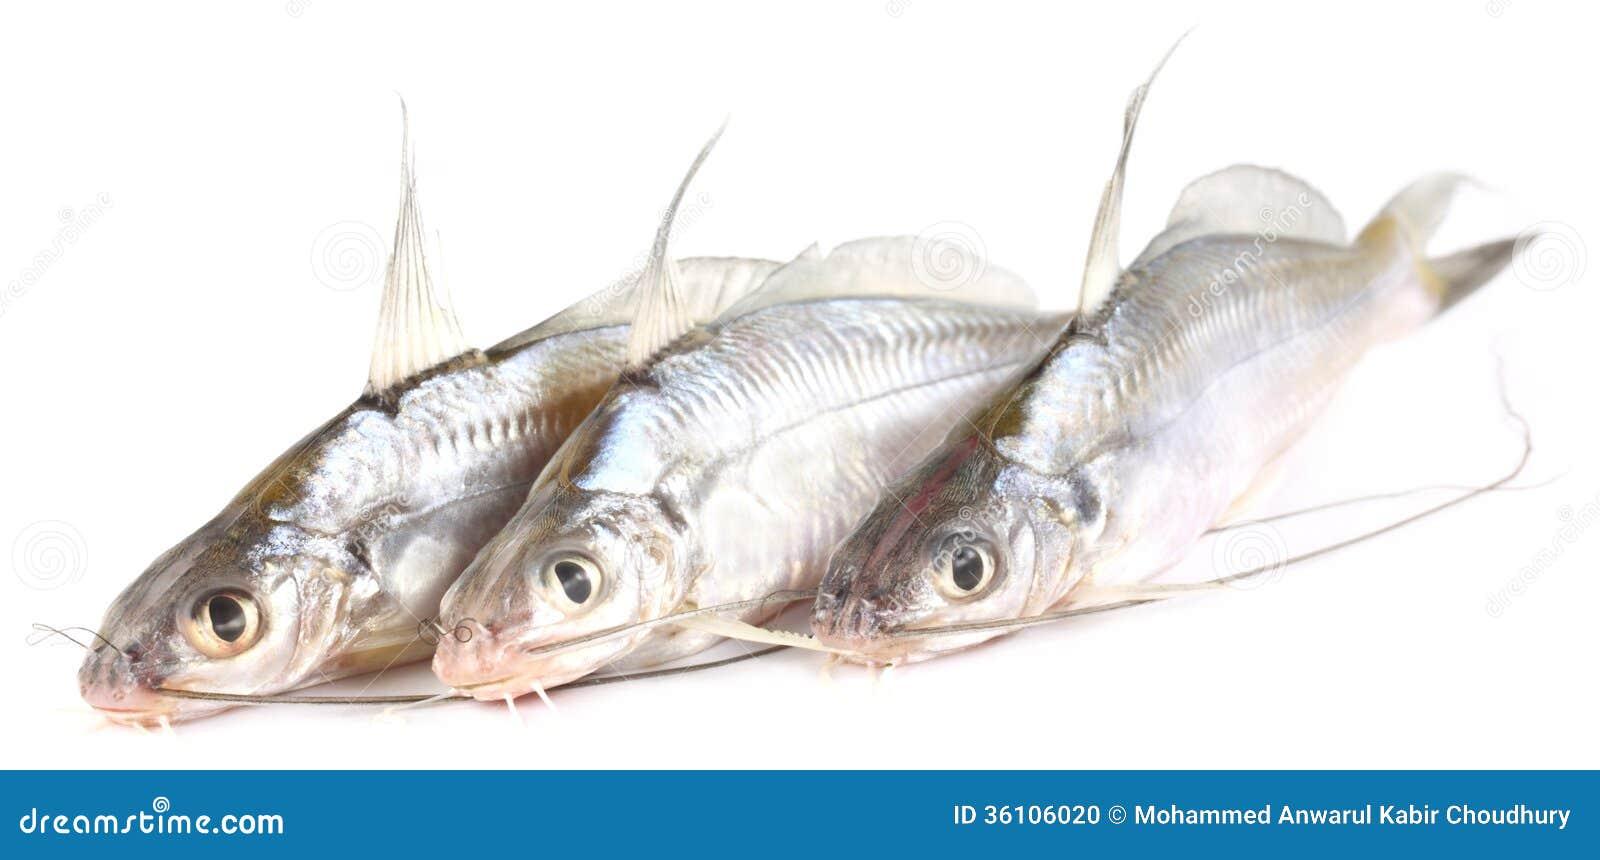 Freshwater Tengra fish of Bangladesh over white background.